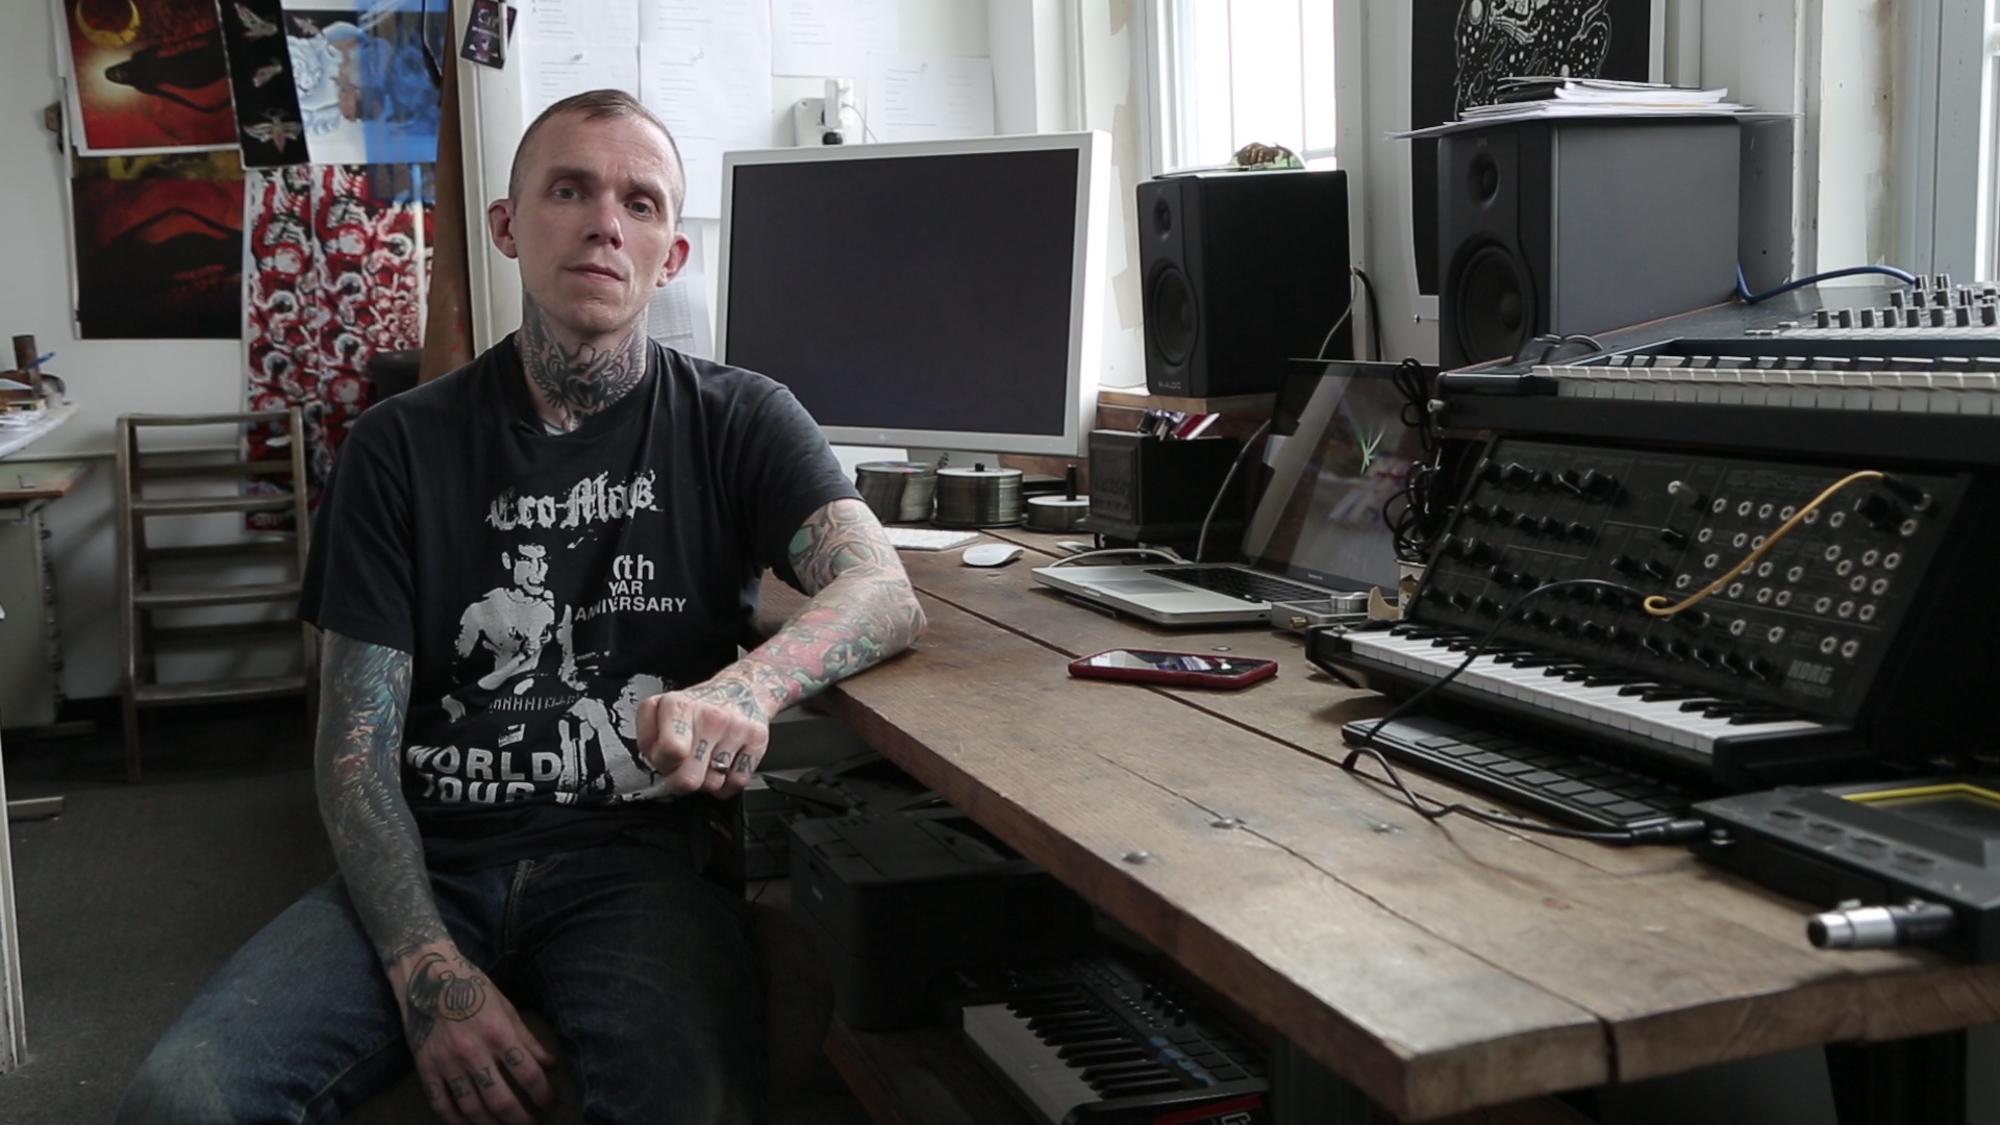 Jake Bannon, of Converge, at Deathwish, Inc. Headquarters, in Massachusetts.